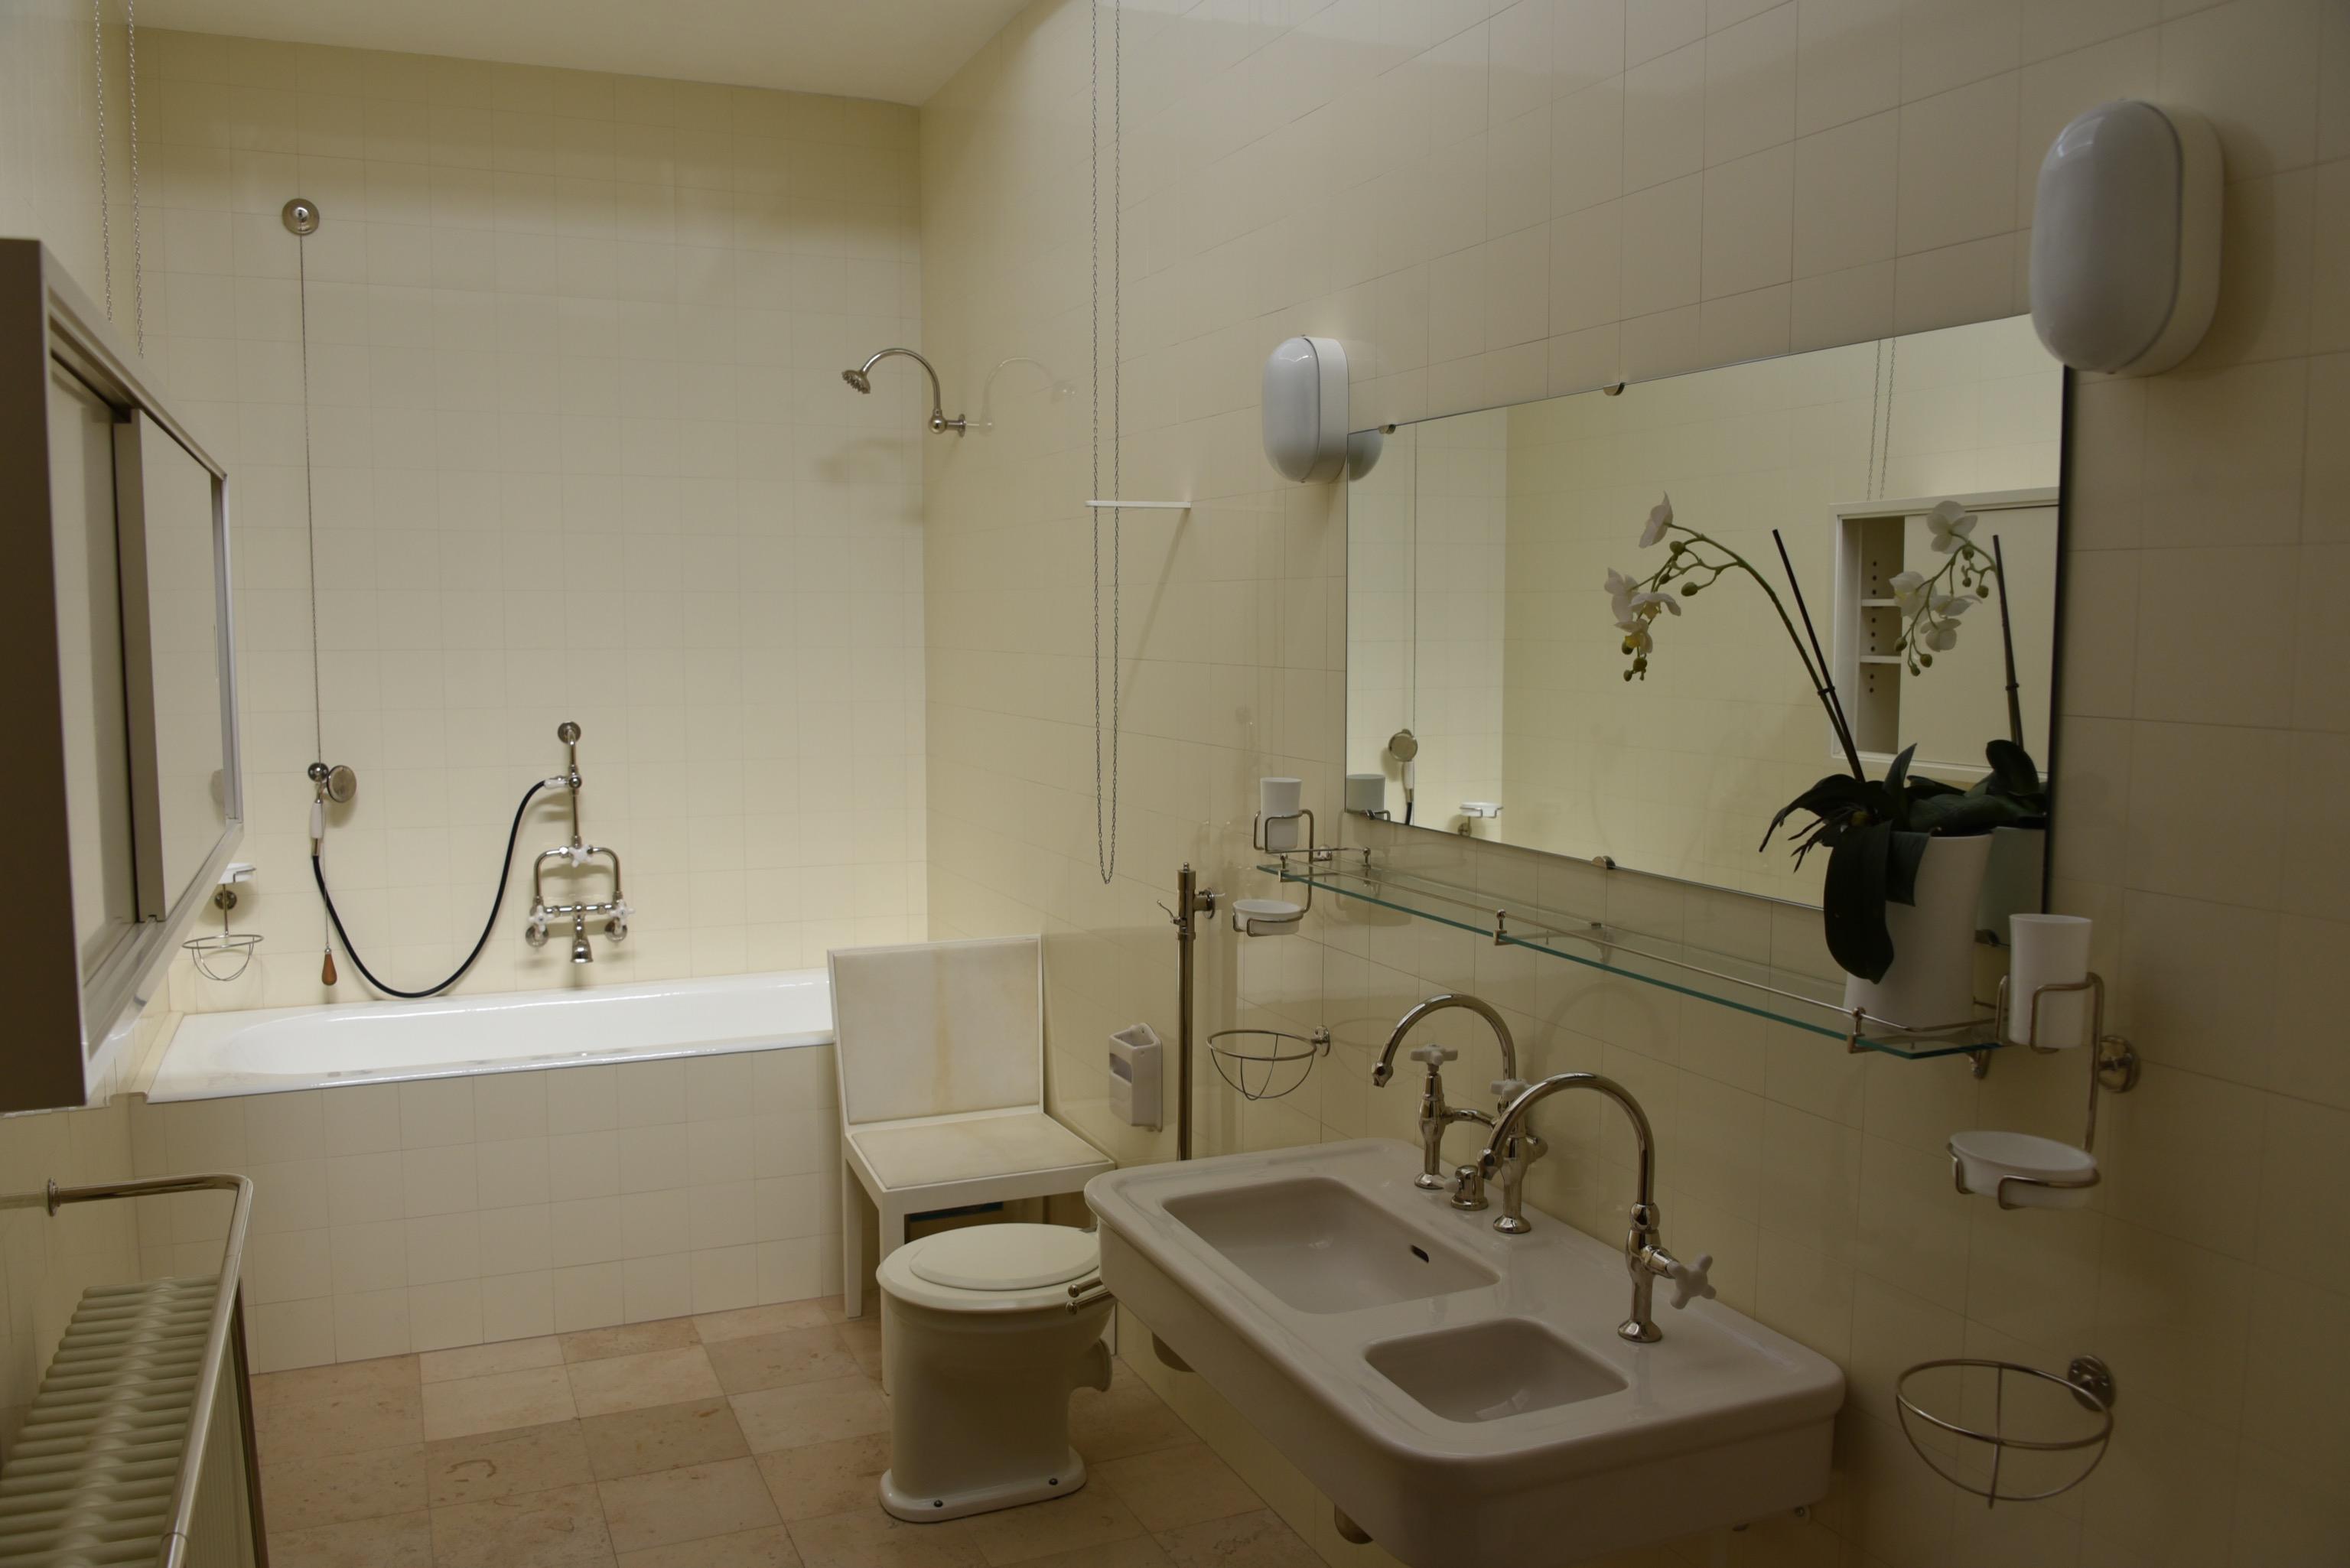 file:villa tugendhat - badezimmer - wikimedia commons, Badezimmer ideen